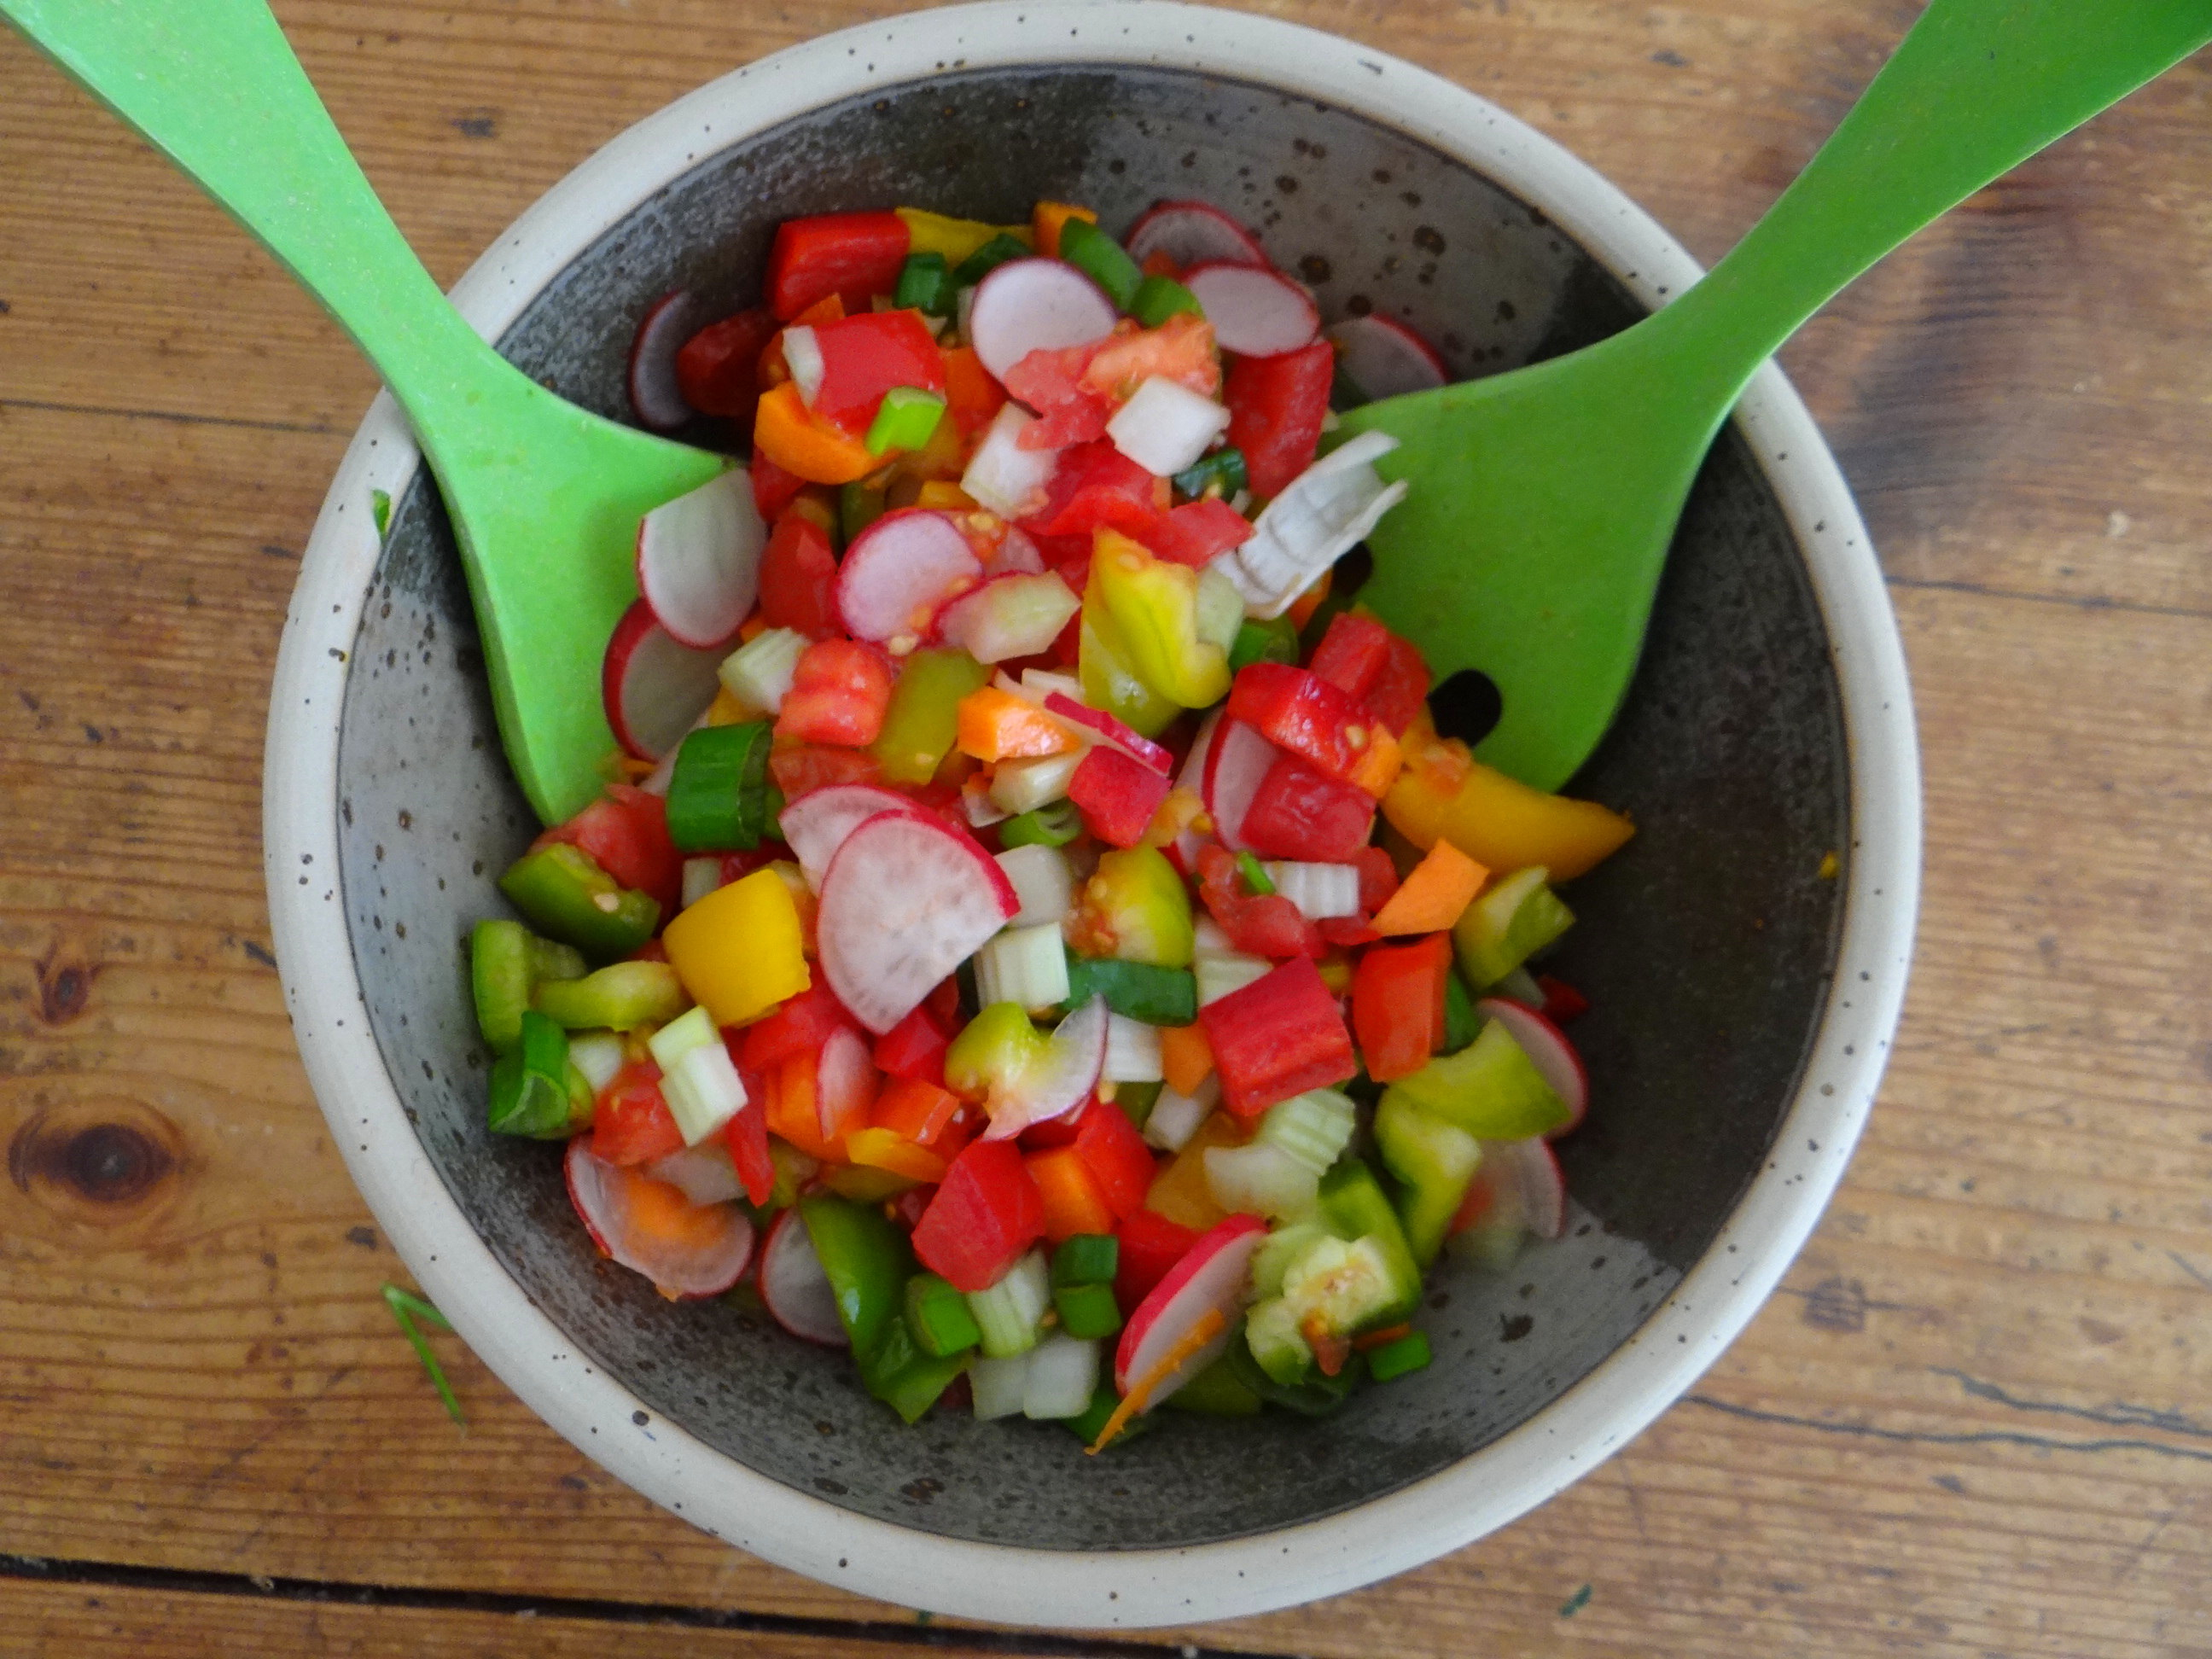 Forelle,Kartoffeln,Salat,Dips (6)